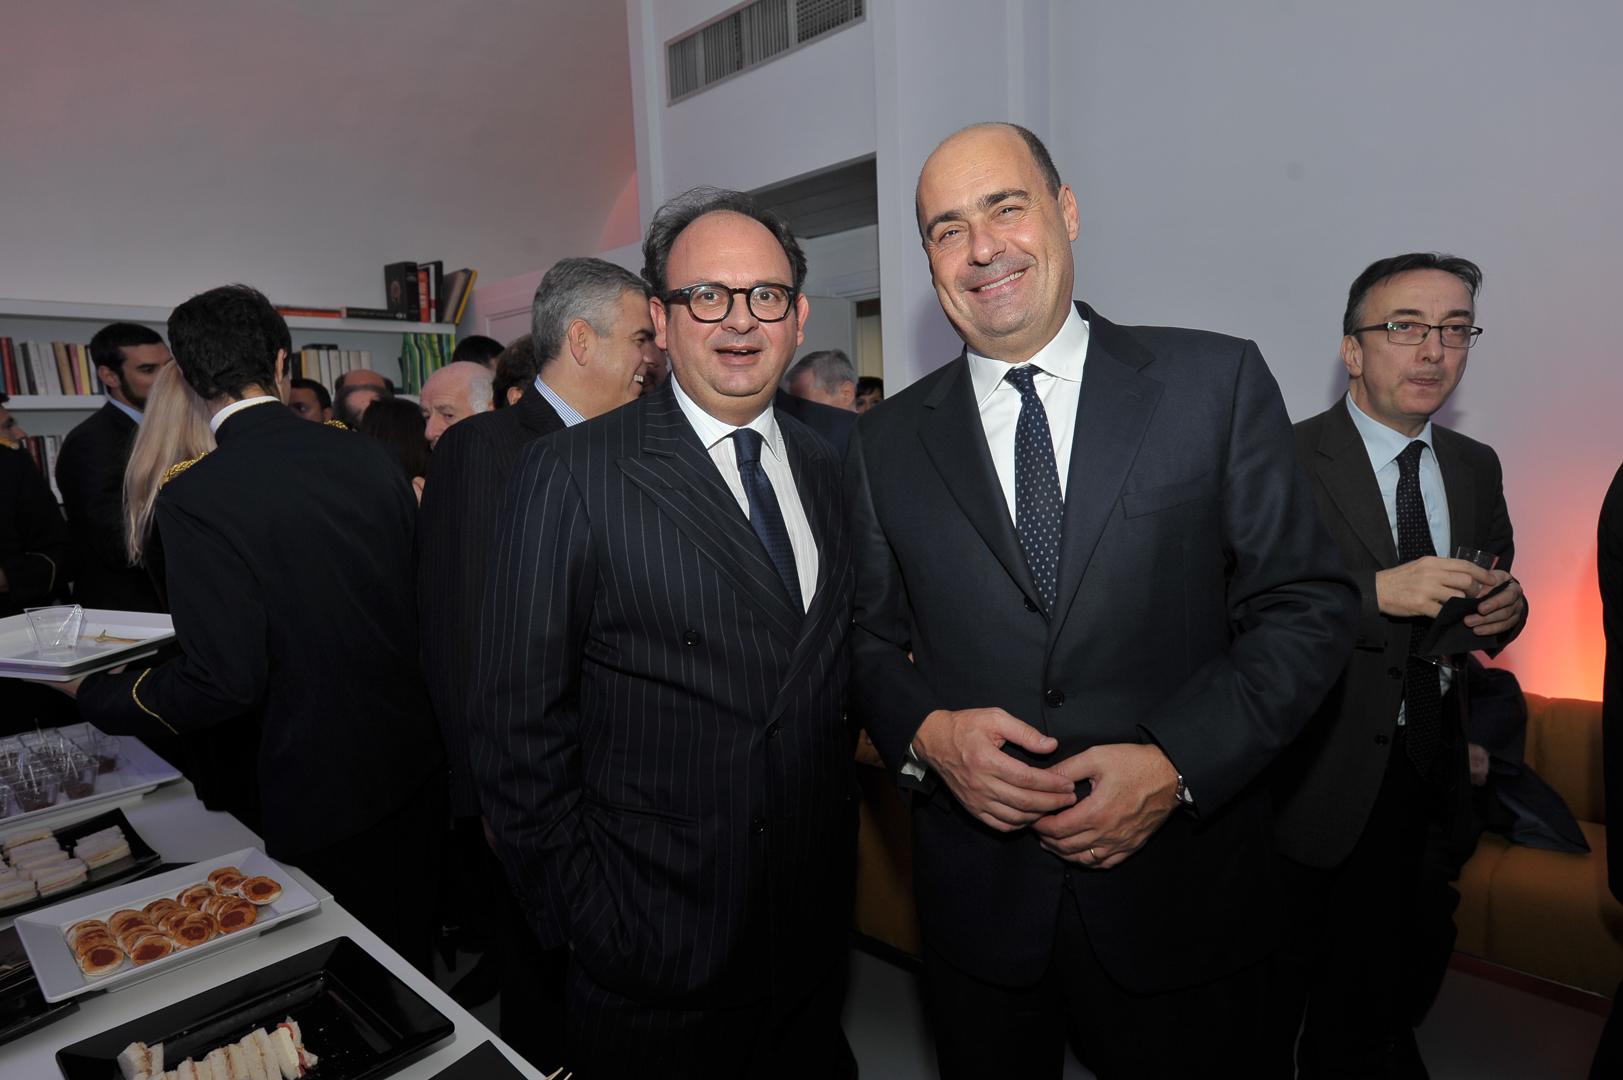 Gianluca Comin e Nicola Zingaretti